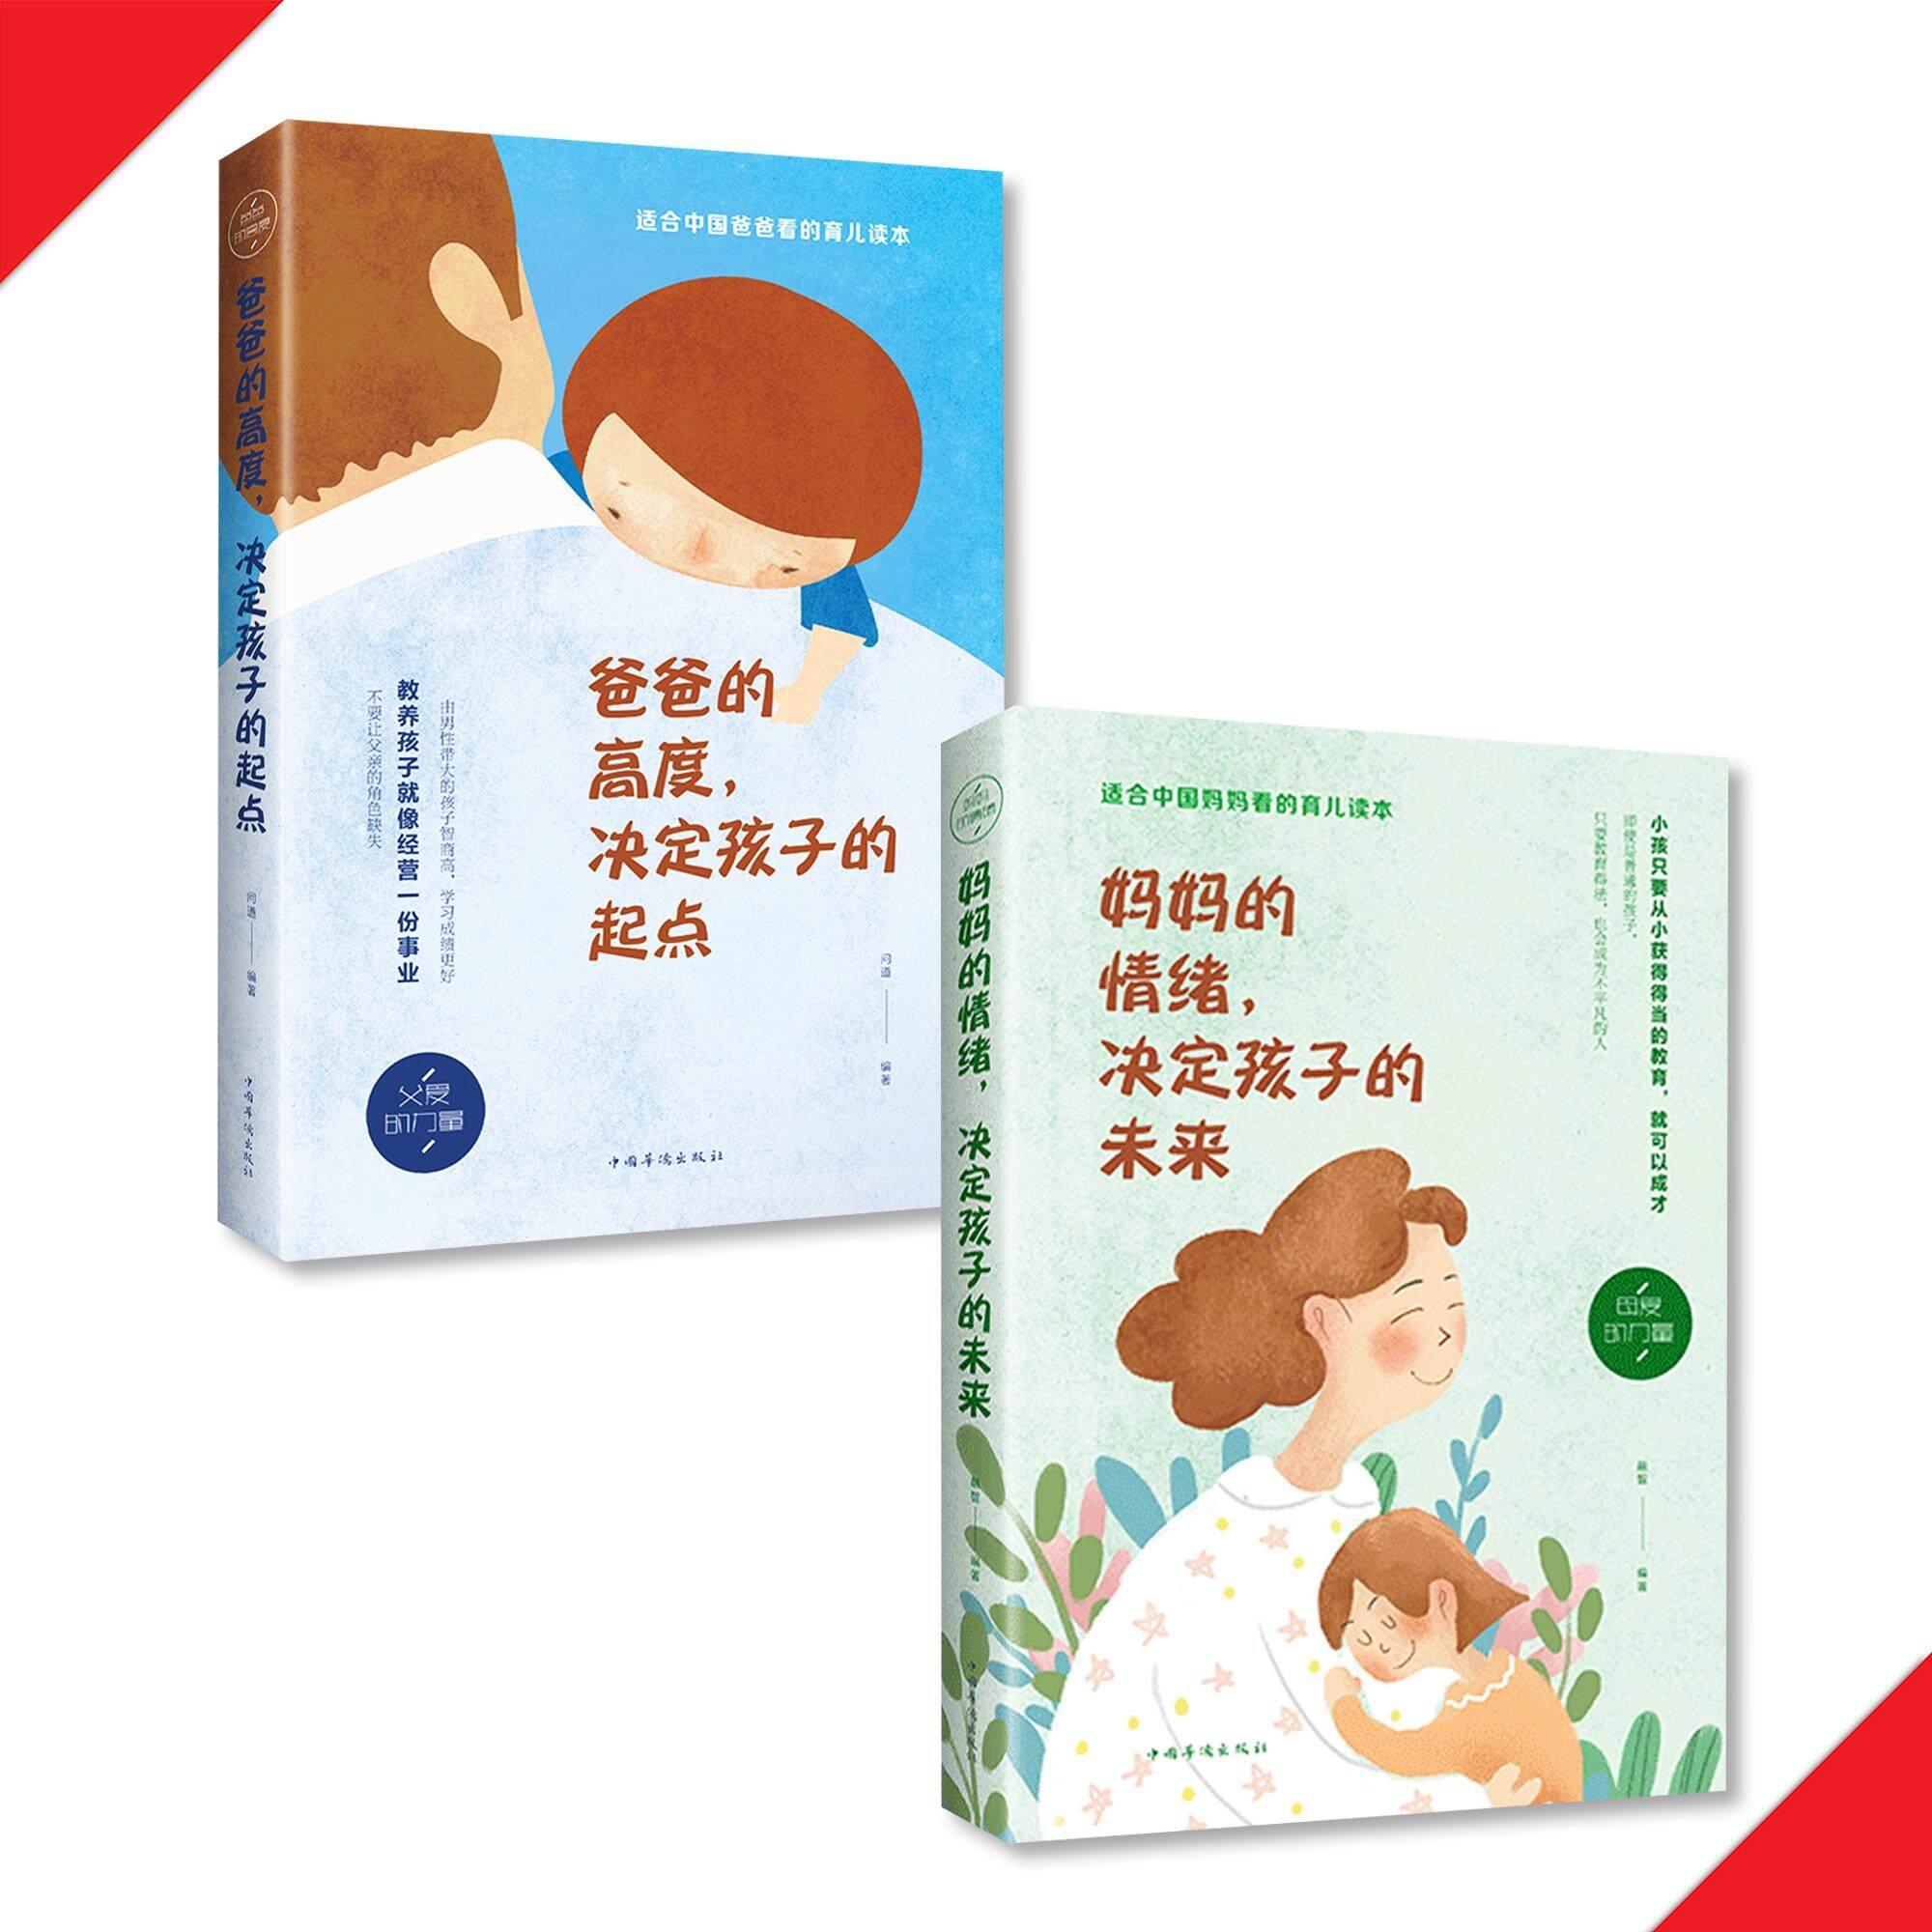 How Parents Can Raise a Good Child 2 Books_Series 4 (爸爸的高度决定孩子的起点+妈妈的情绪决定孩子的未来)